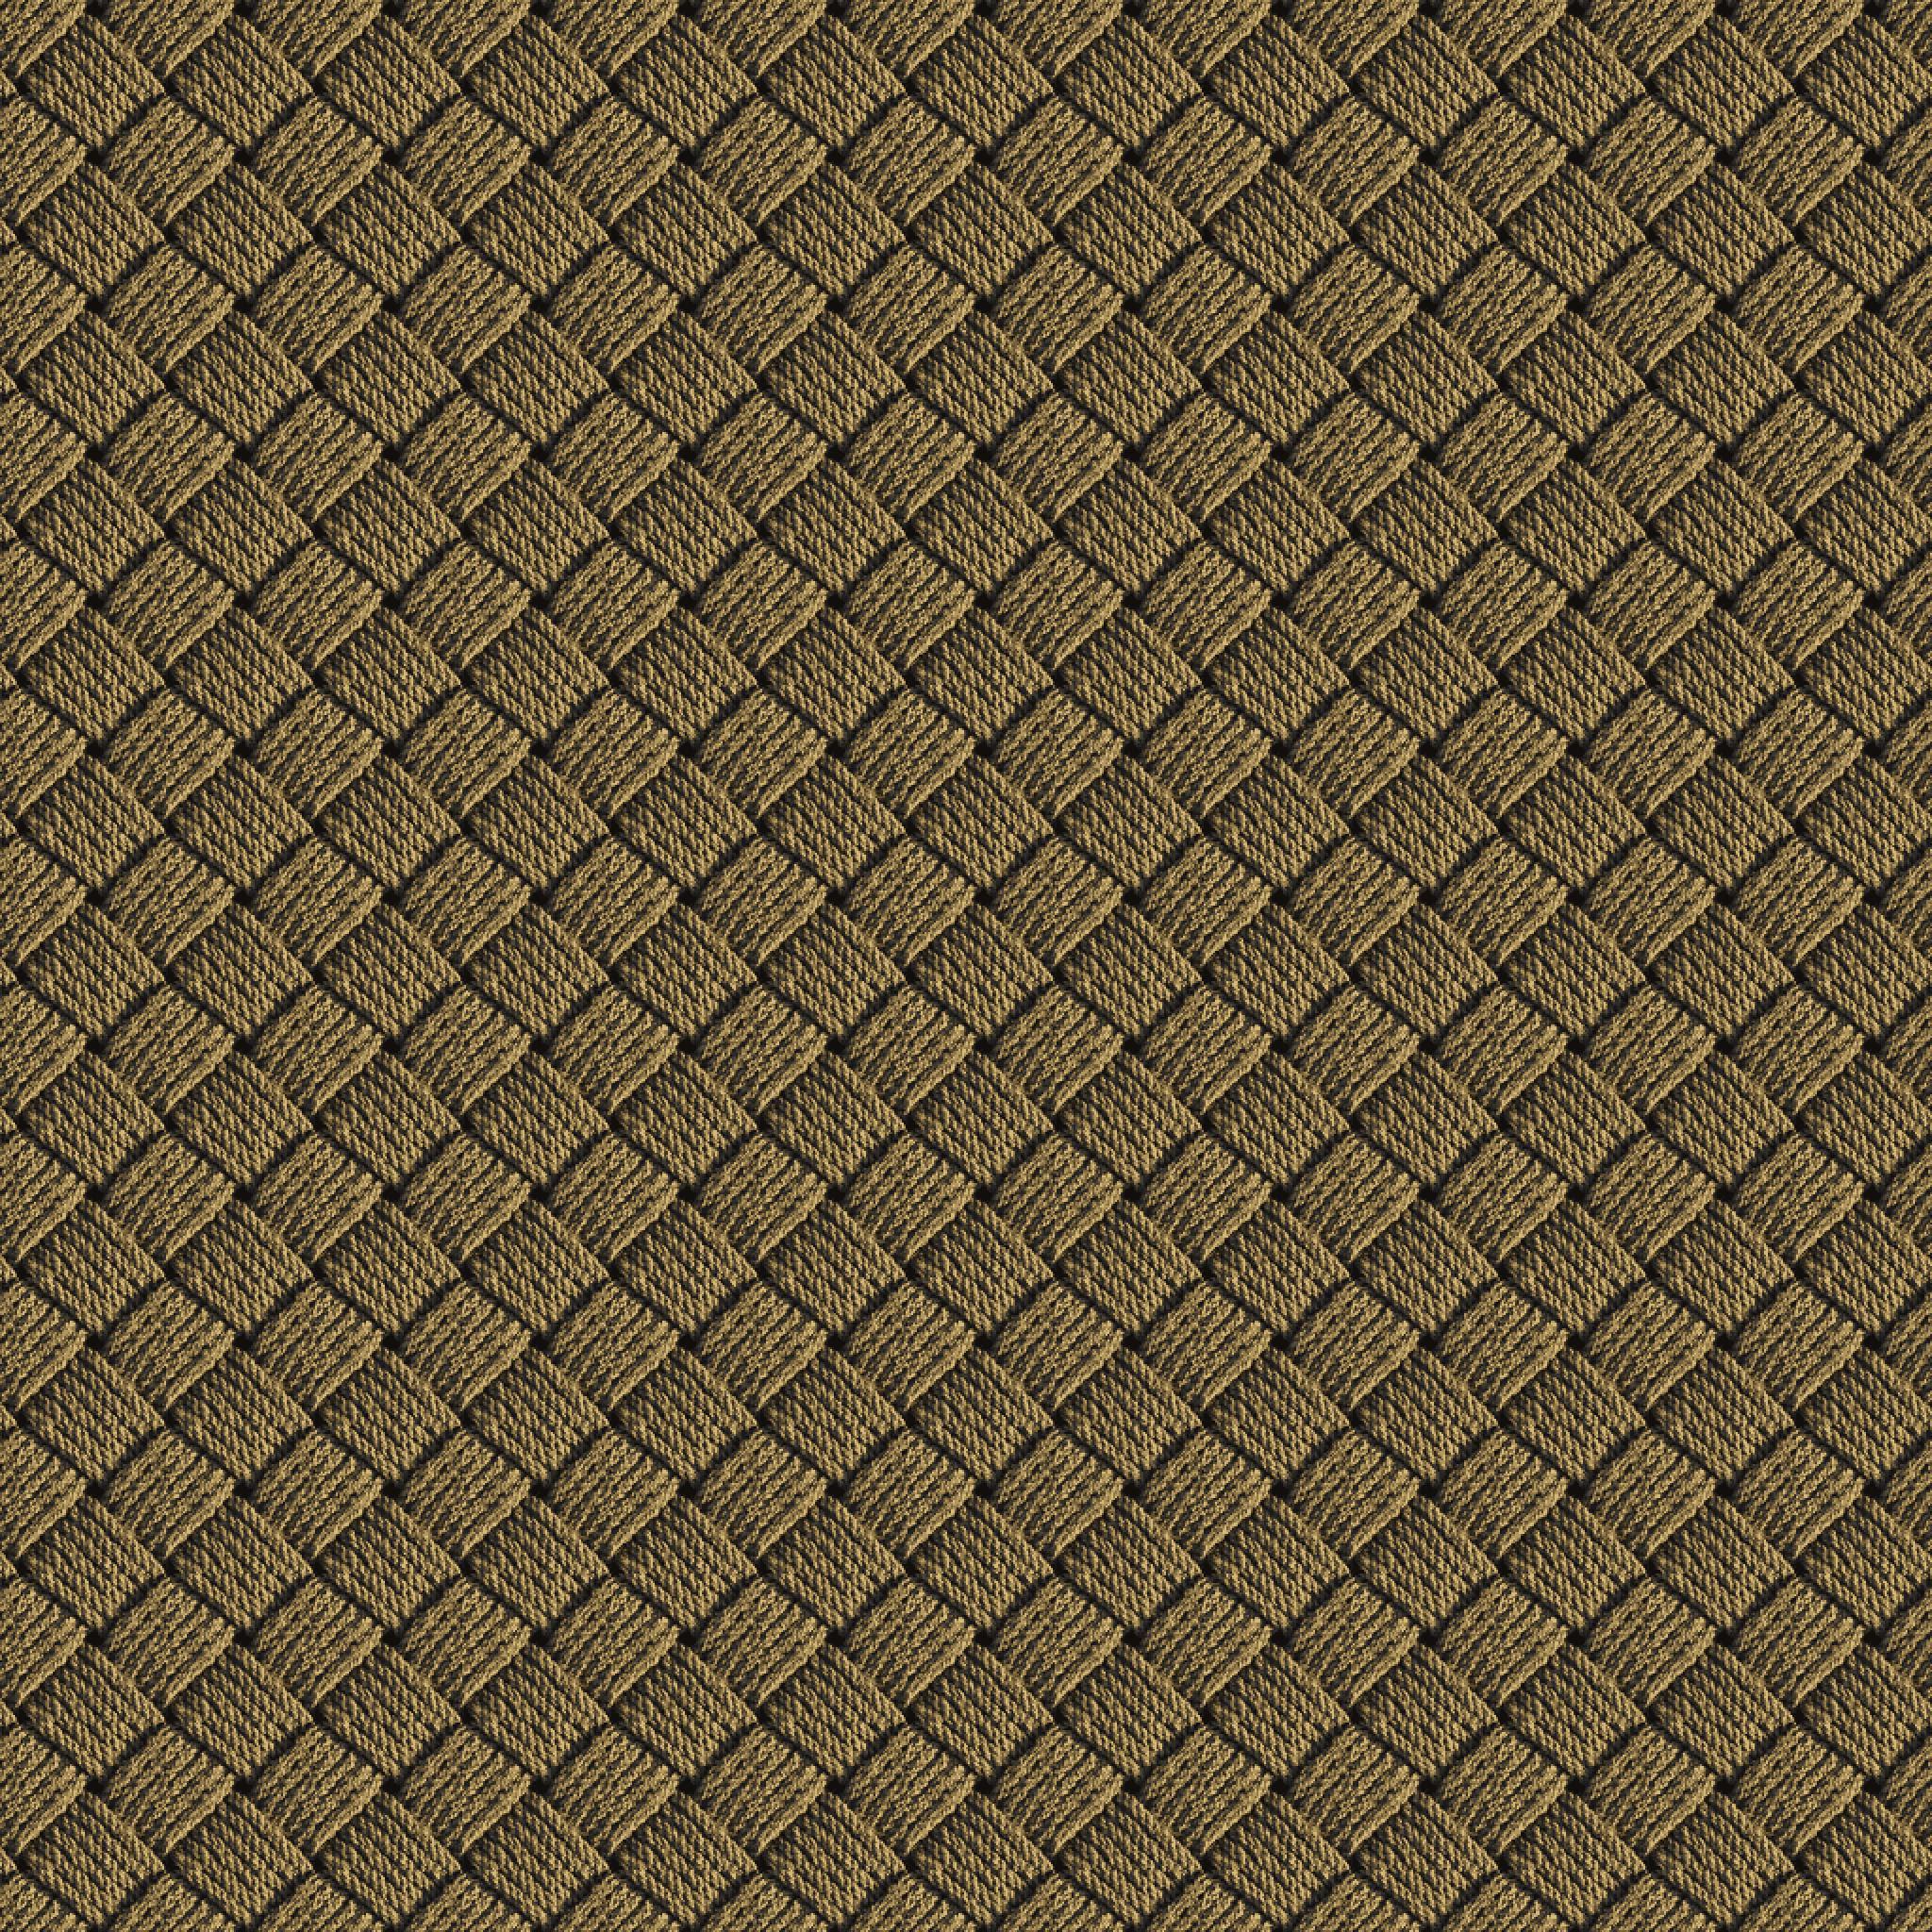 Space Wallpaper Hd Iphone Sed